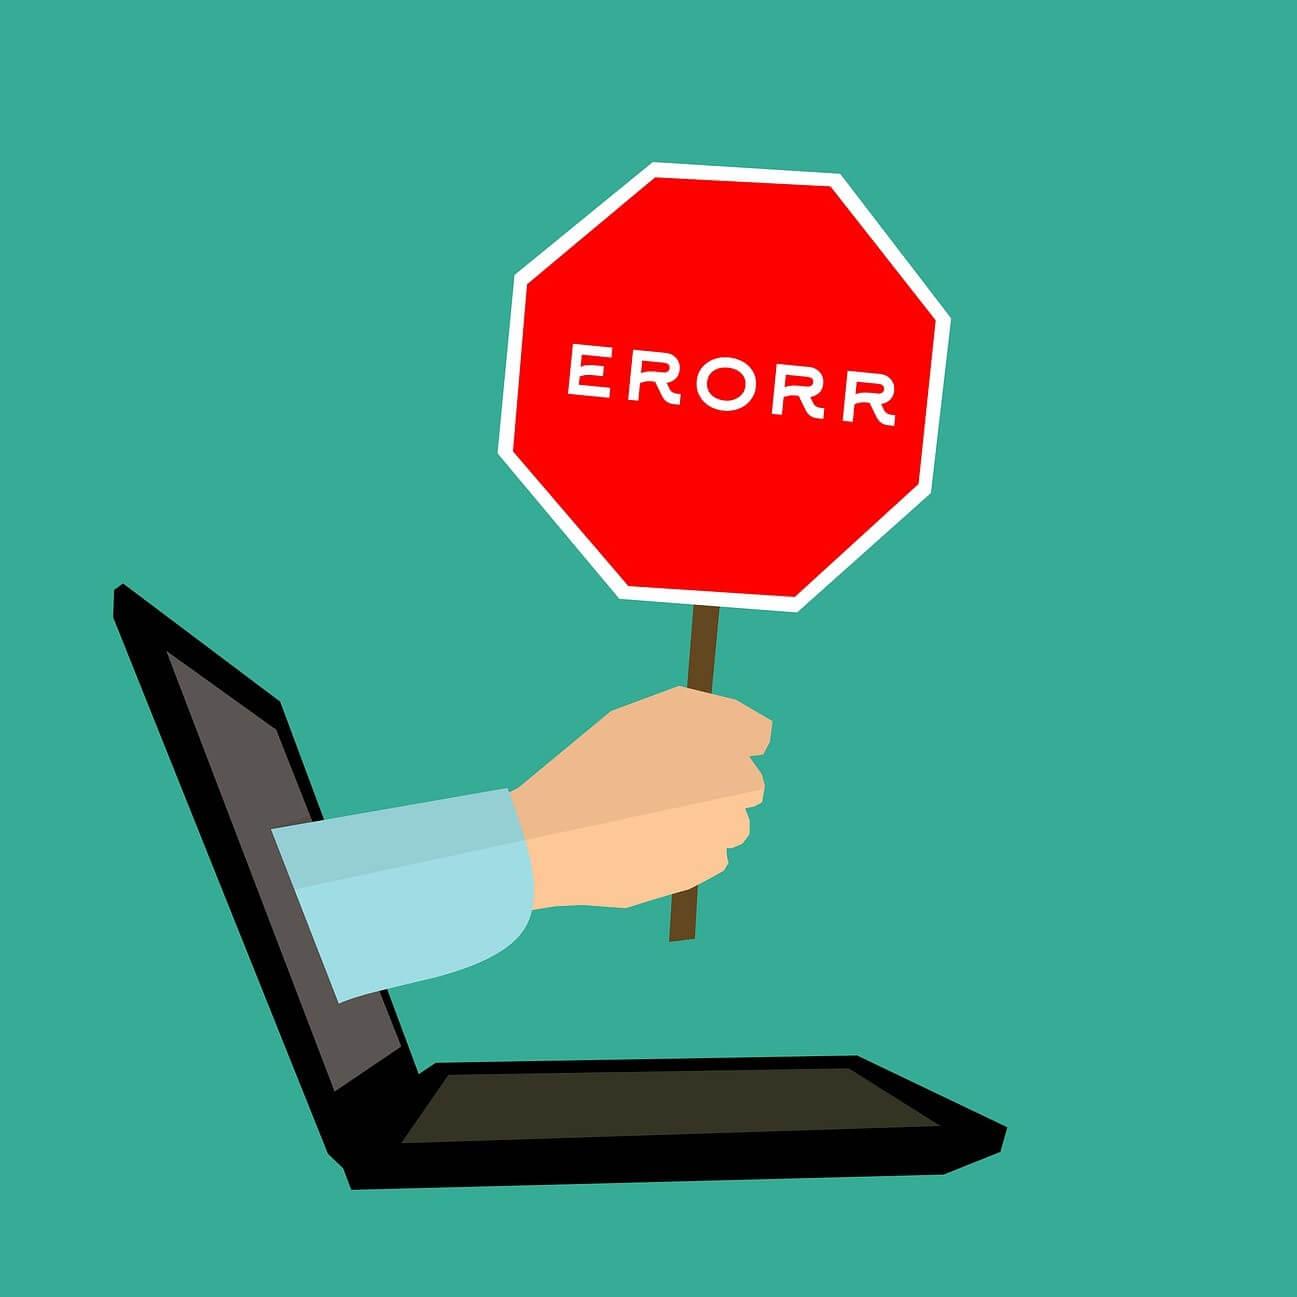 software errors